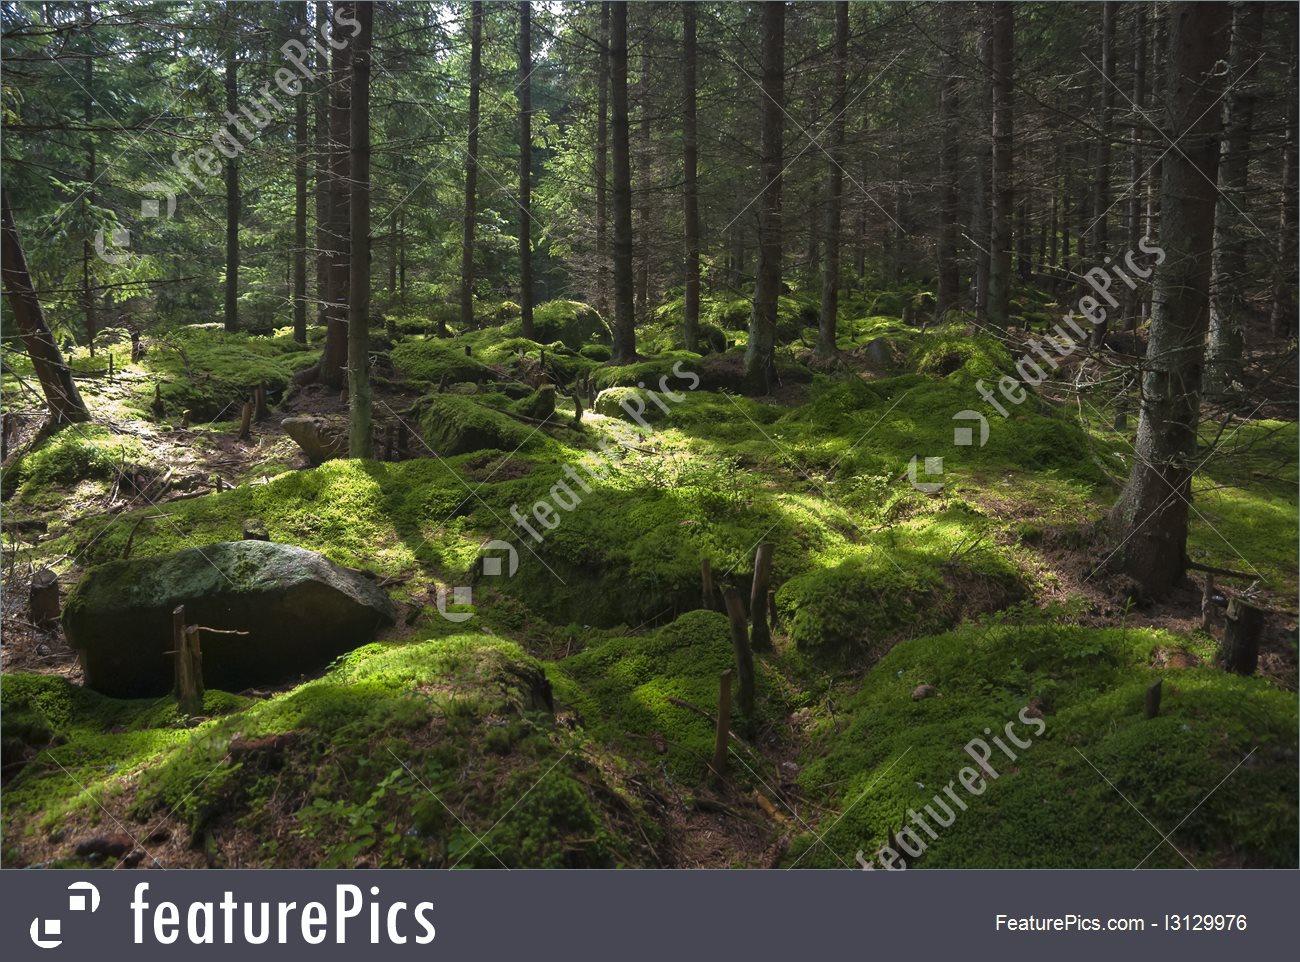 Nature Landscapes: The Primeval Forest.